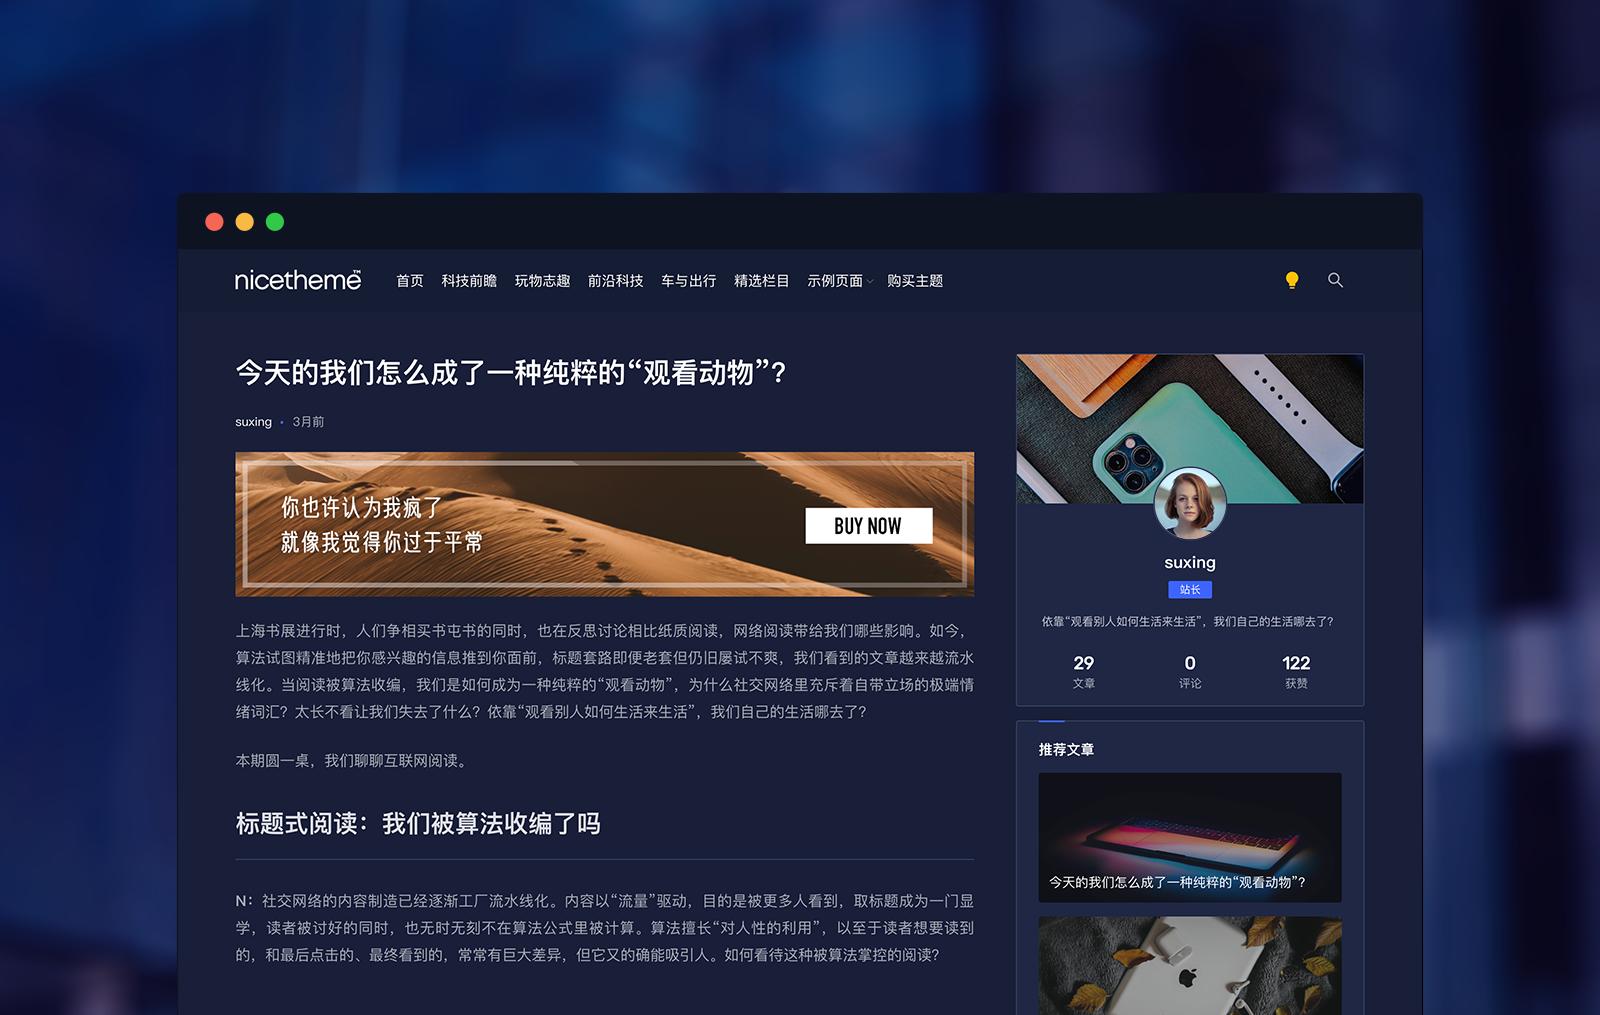 PandaPRO 主题更新至 v2.0-nicetheme